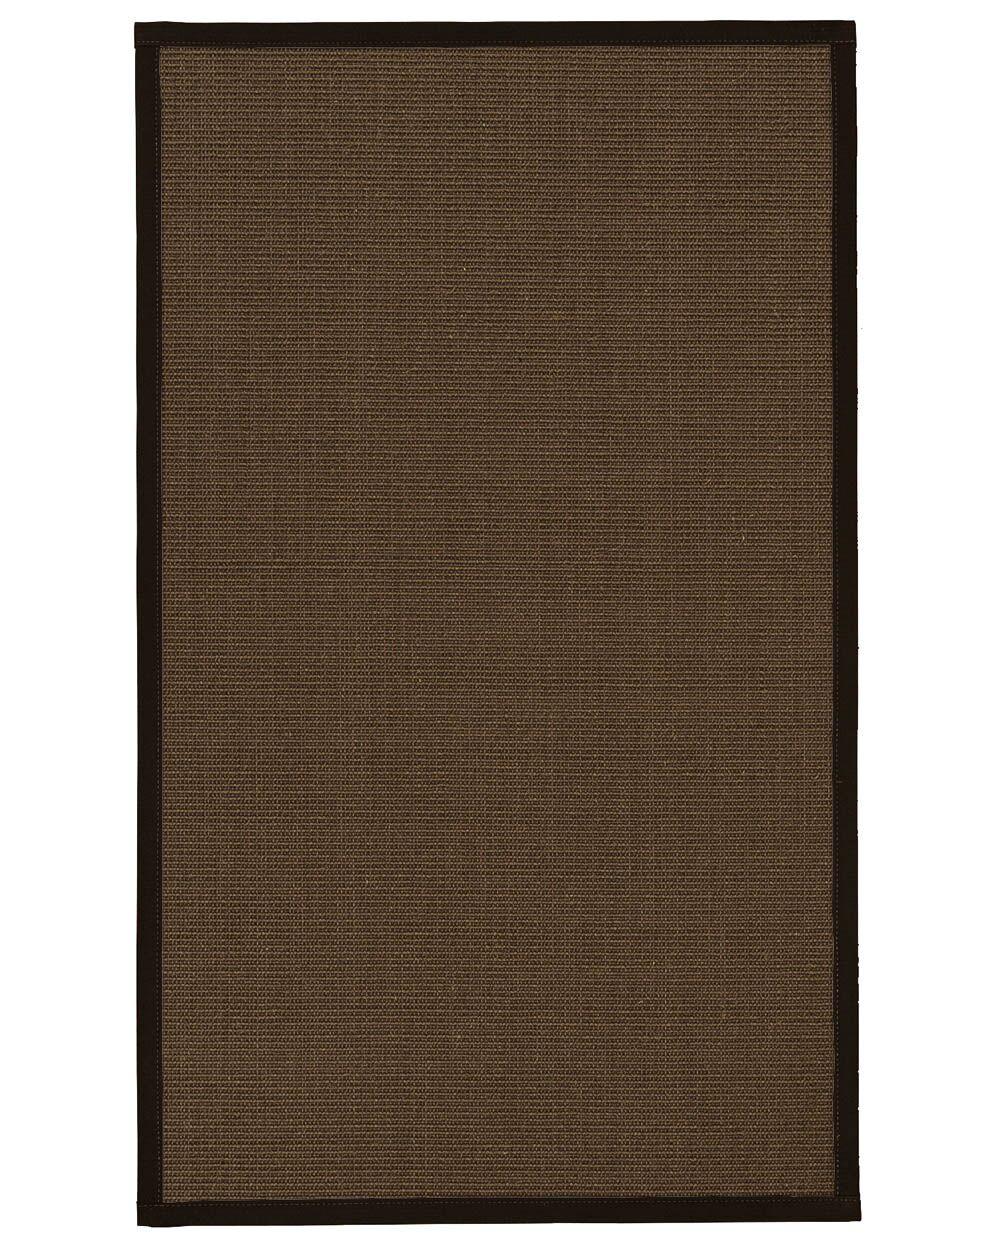 Beck Natural Fiber Sisal Plus Bonus Hand-Woven Beige Area Rug Rug Size: Rectangle 4' x 6'